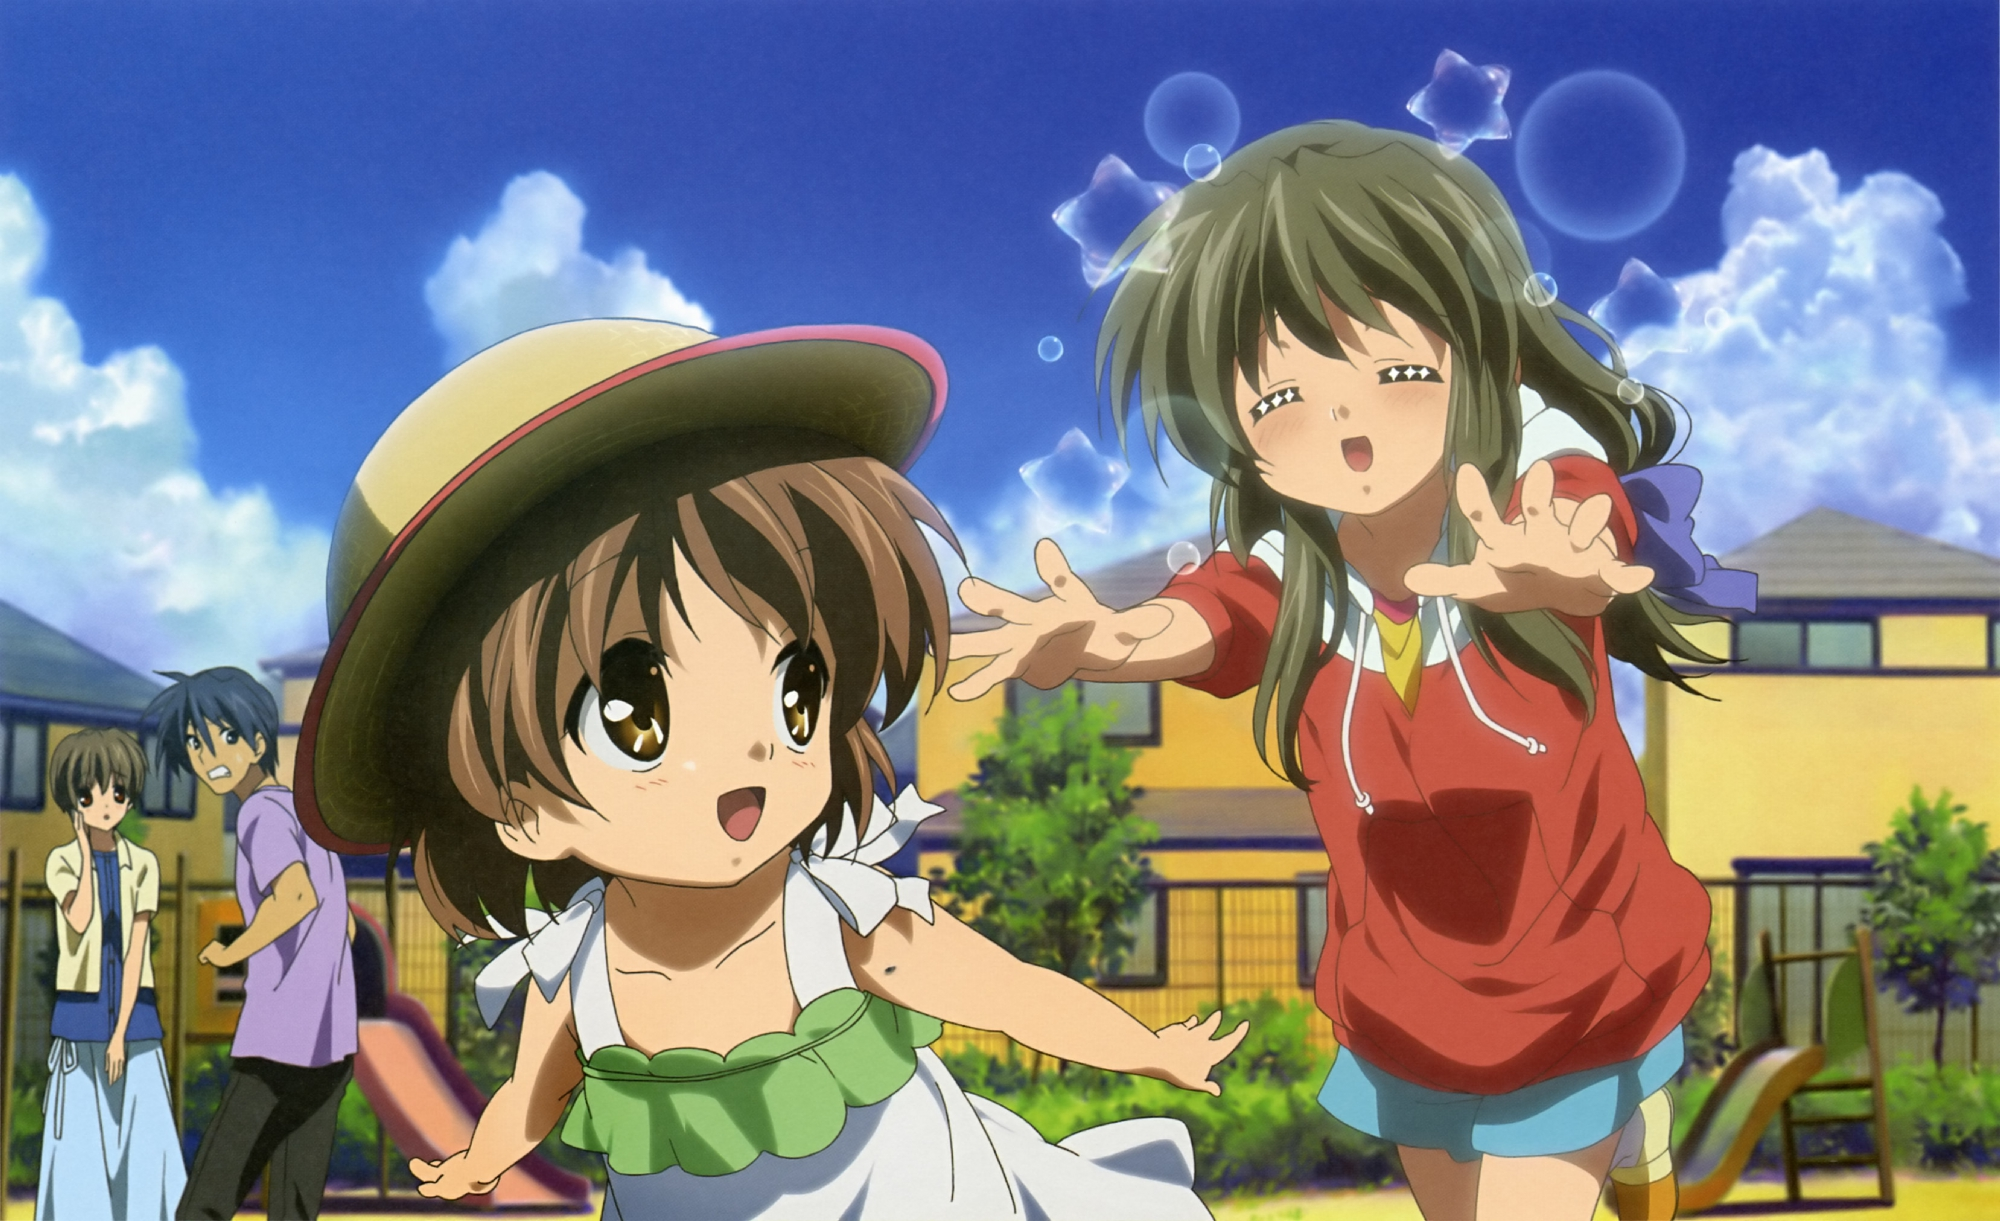 blush clannad dress hat ibuki_fuuko ibuki_kouko okazaki_tomoya okazaki_ushio scan short_hair takahashi_mariko